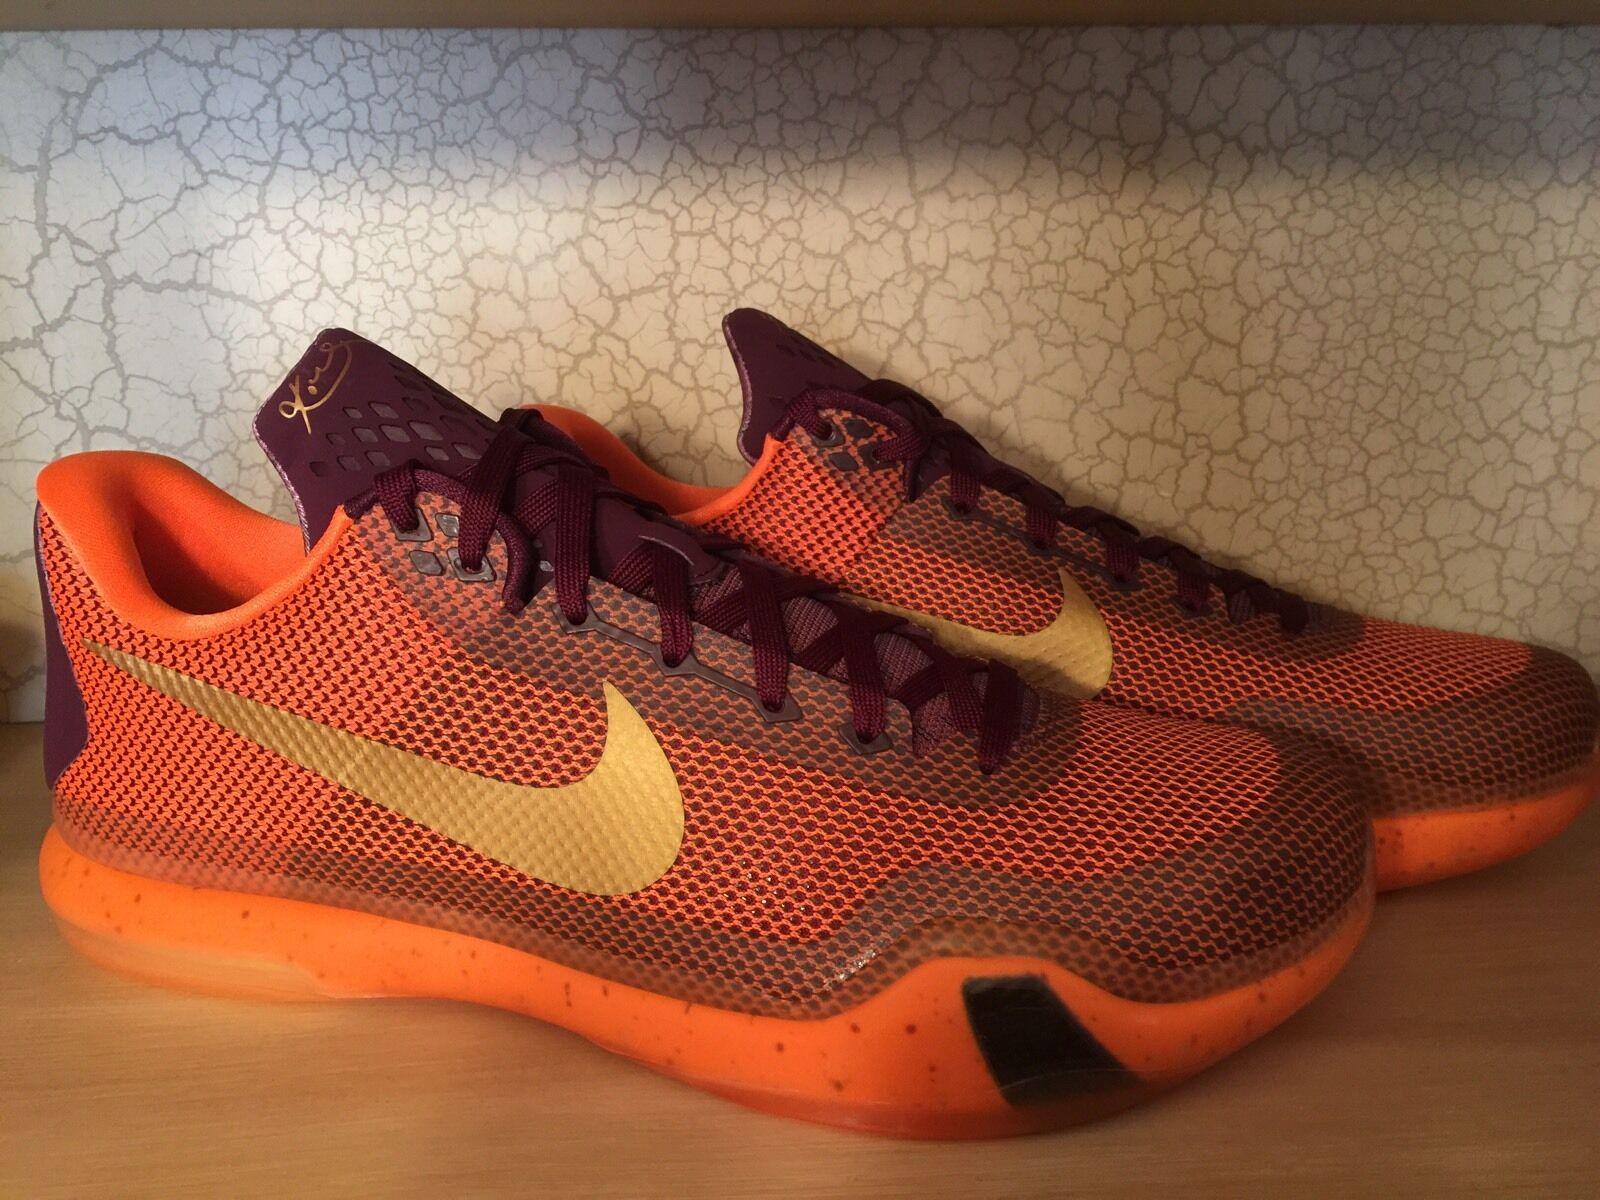 DS NEW Nike Kobe X silk road 10 IX 9 V IV 1 prelude 705317 676 elite FTB Sz 14